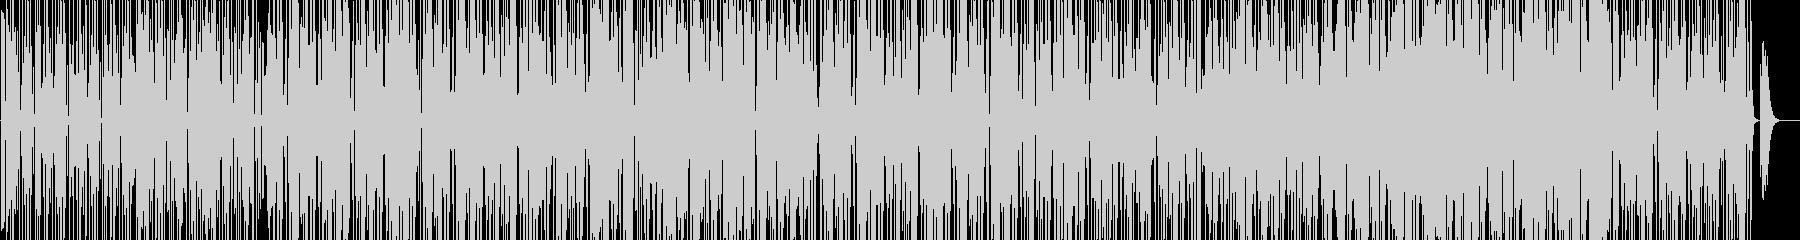 showerの未再生の波形